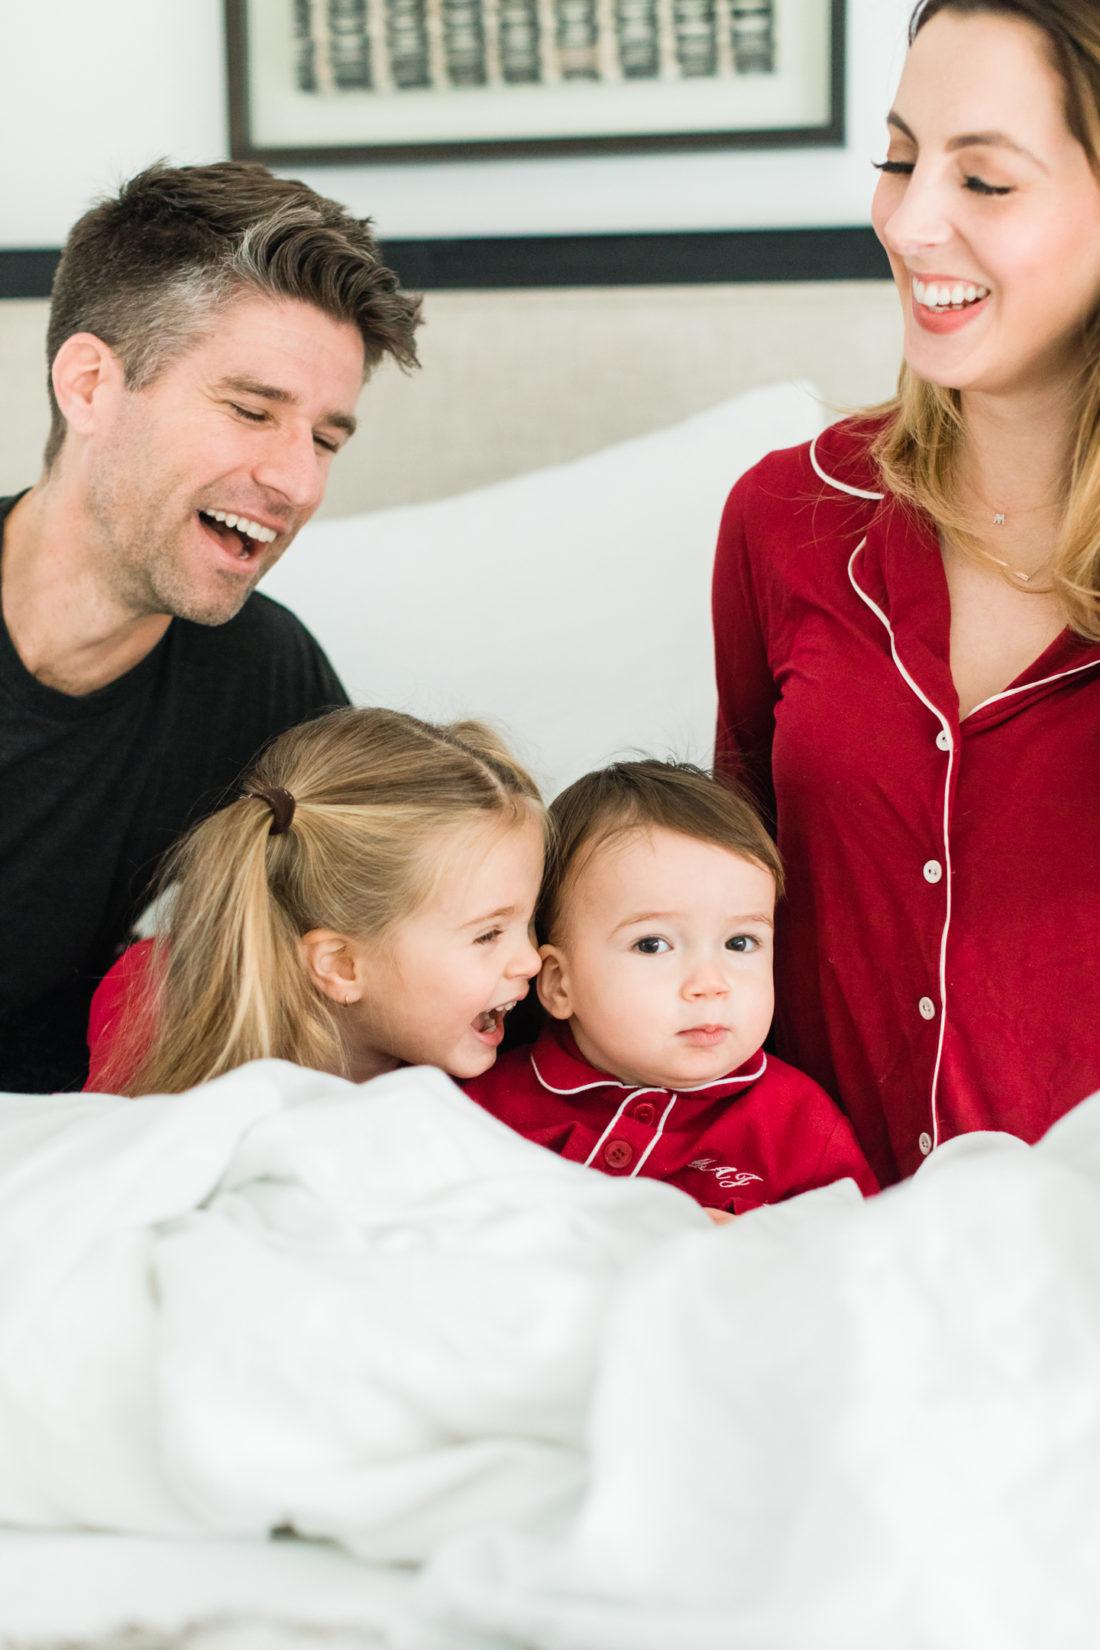 Marlowe Martino snuggles up with brother Major Martino wearing matching red pajamas